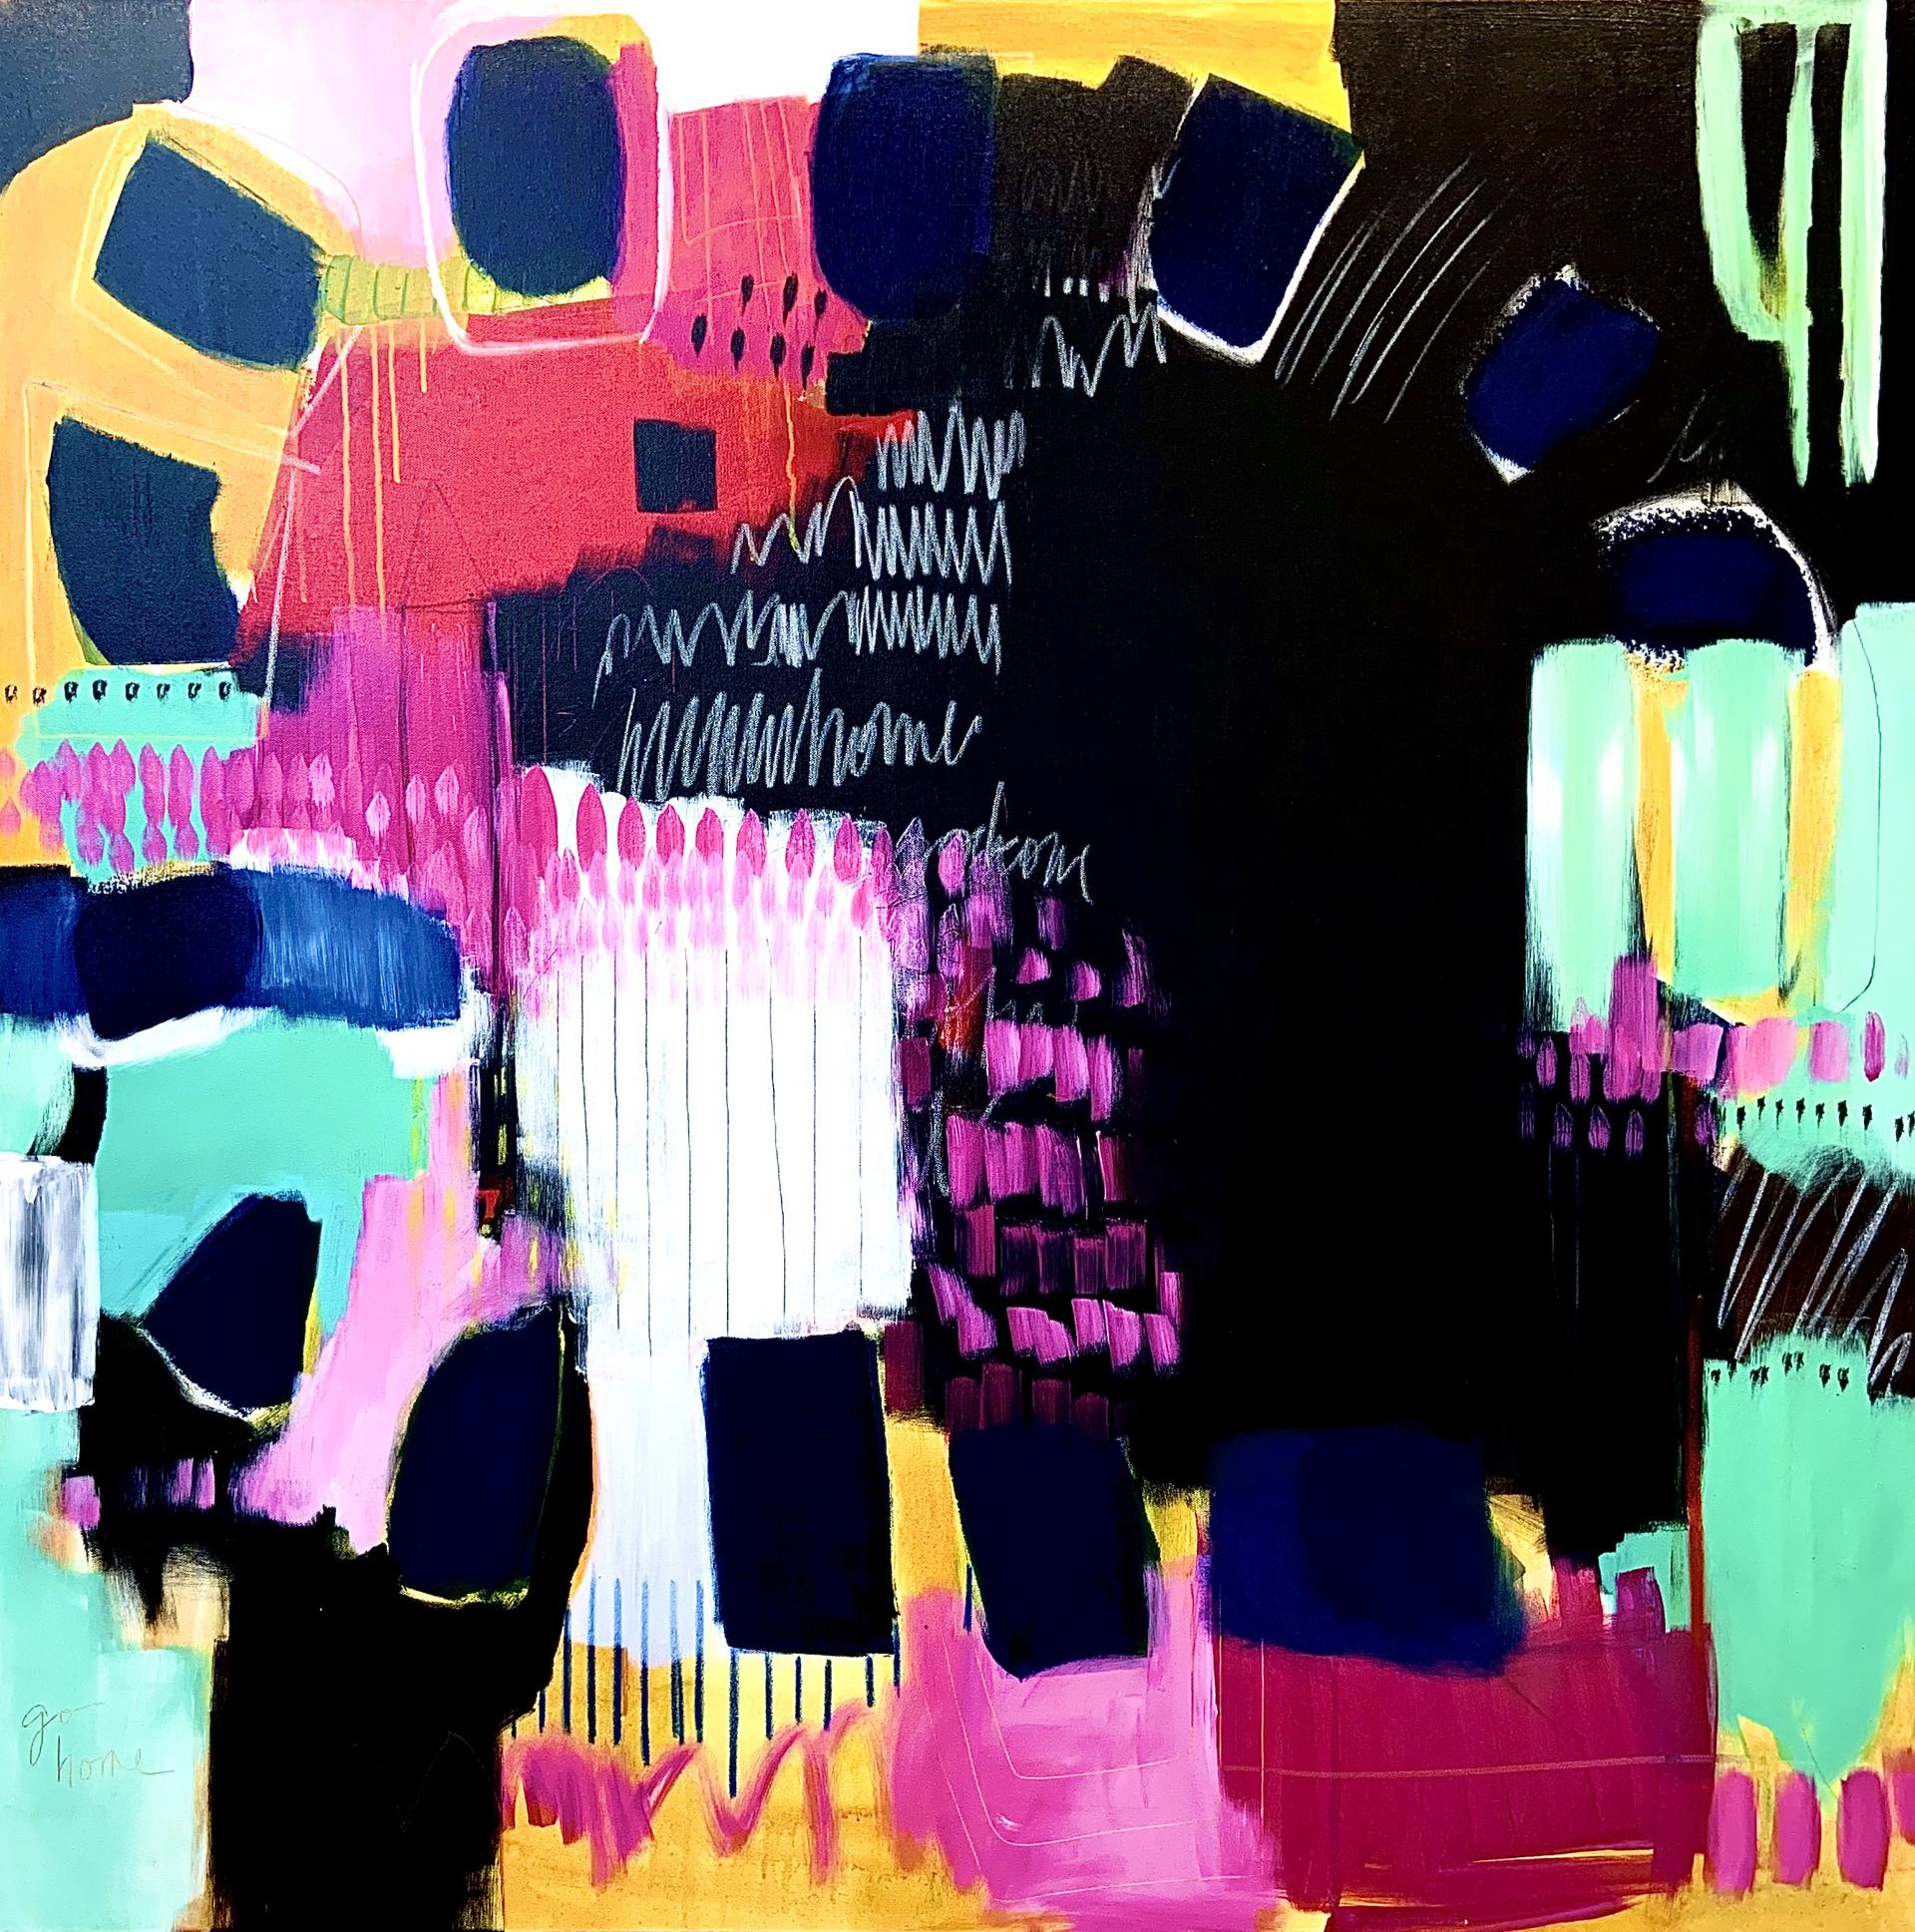 Go Home by Leslie Gaworecki